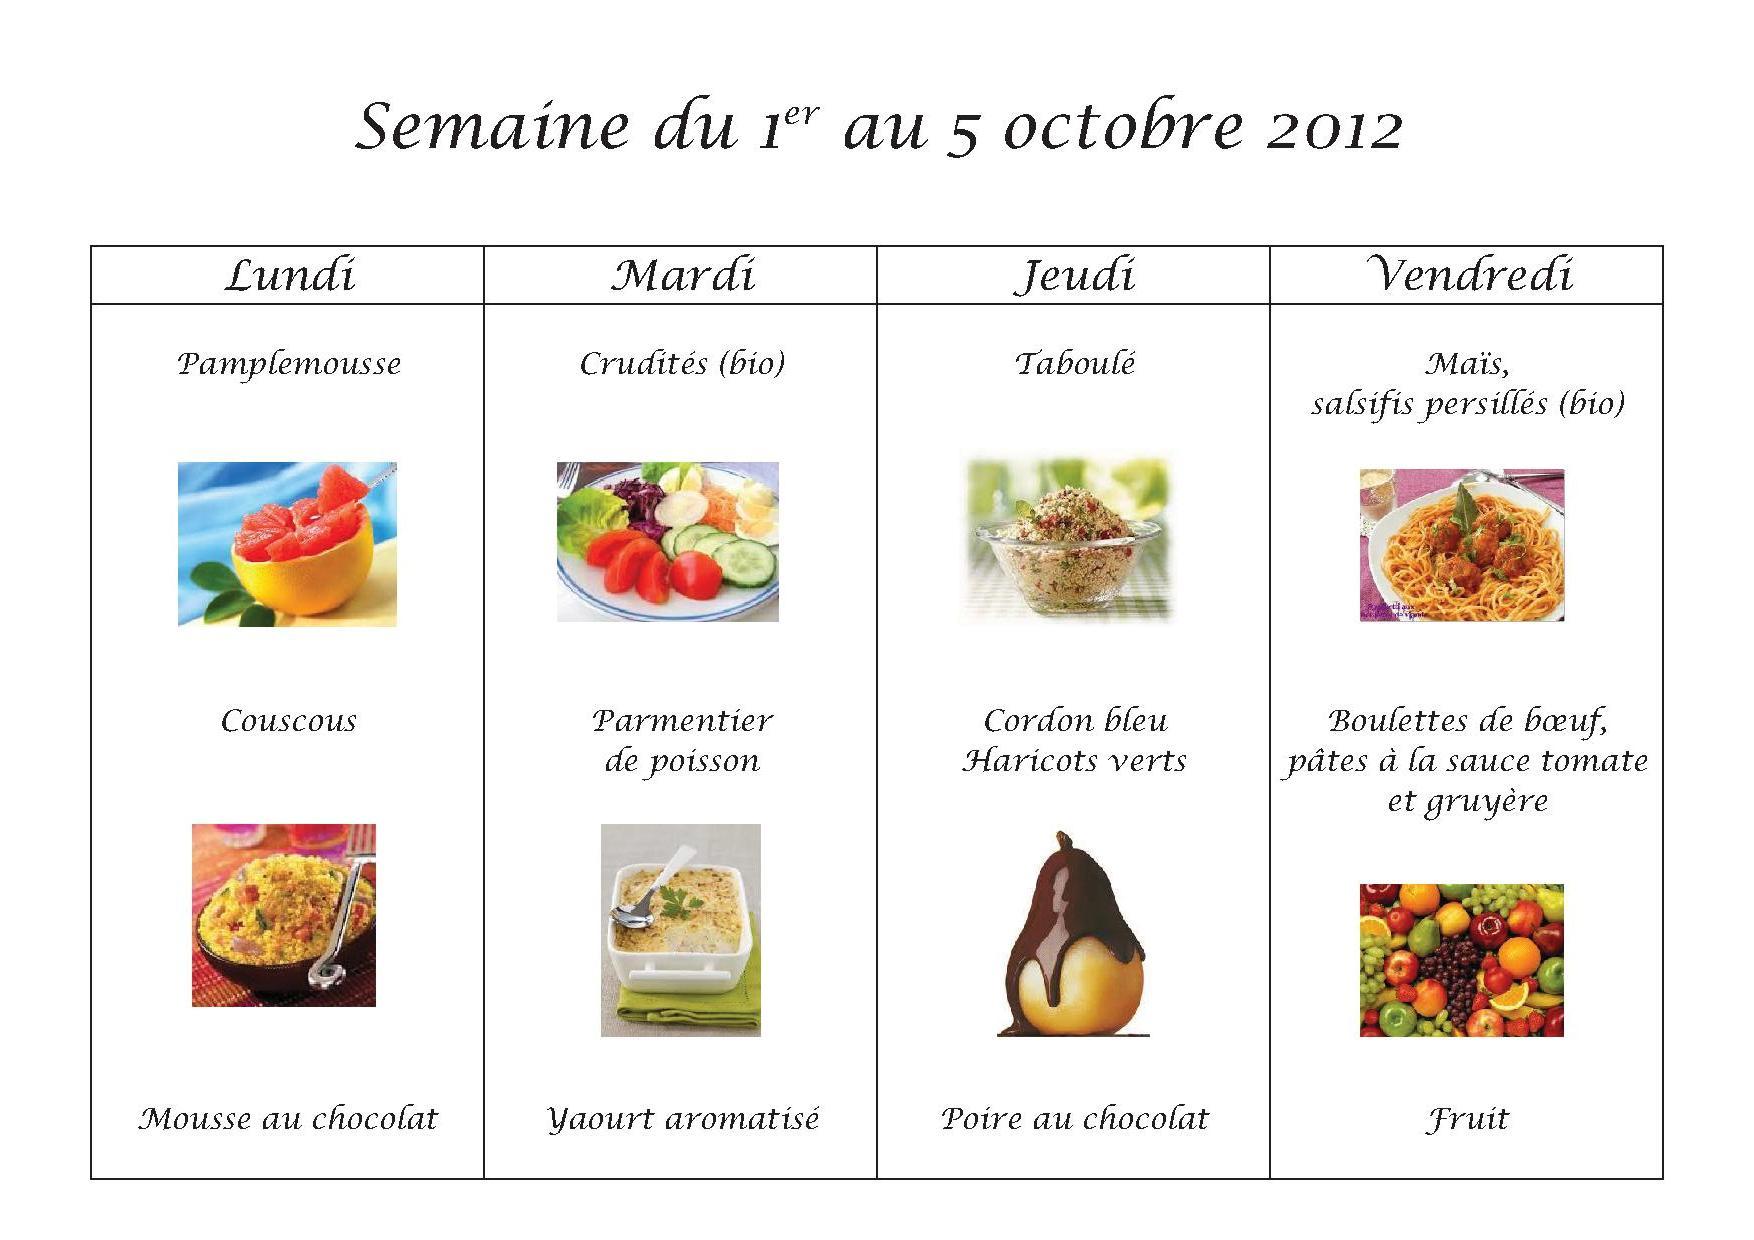 Menus du 1er au 5 octobre 2012